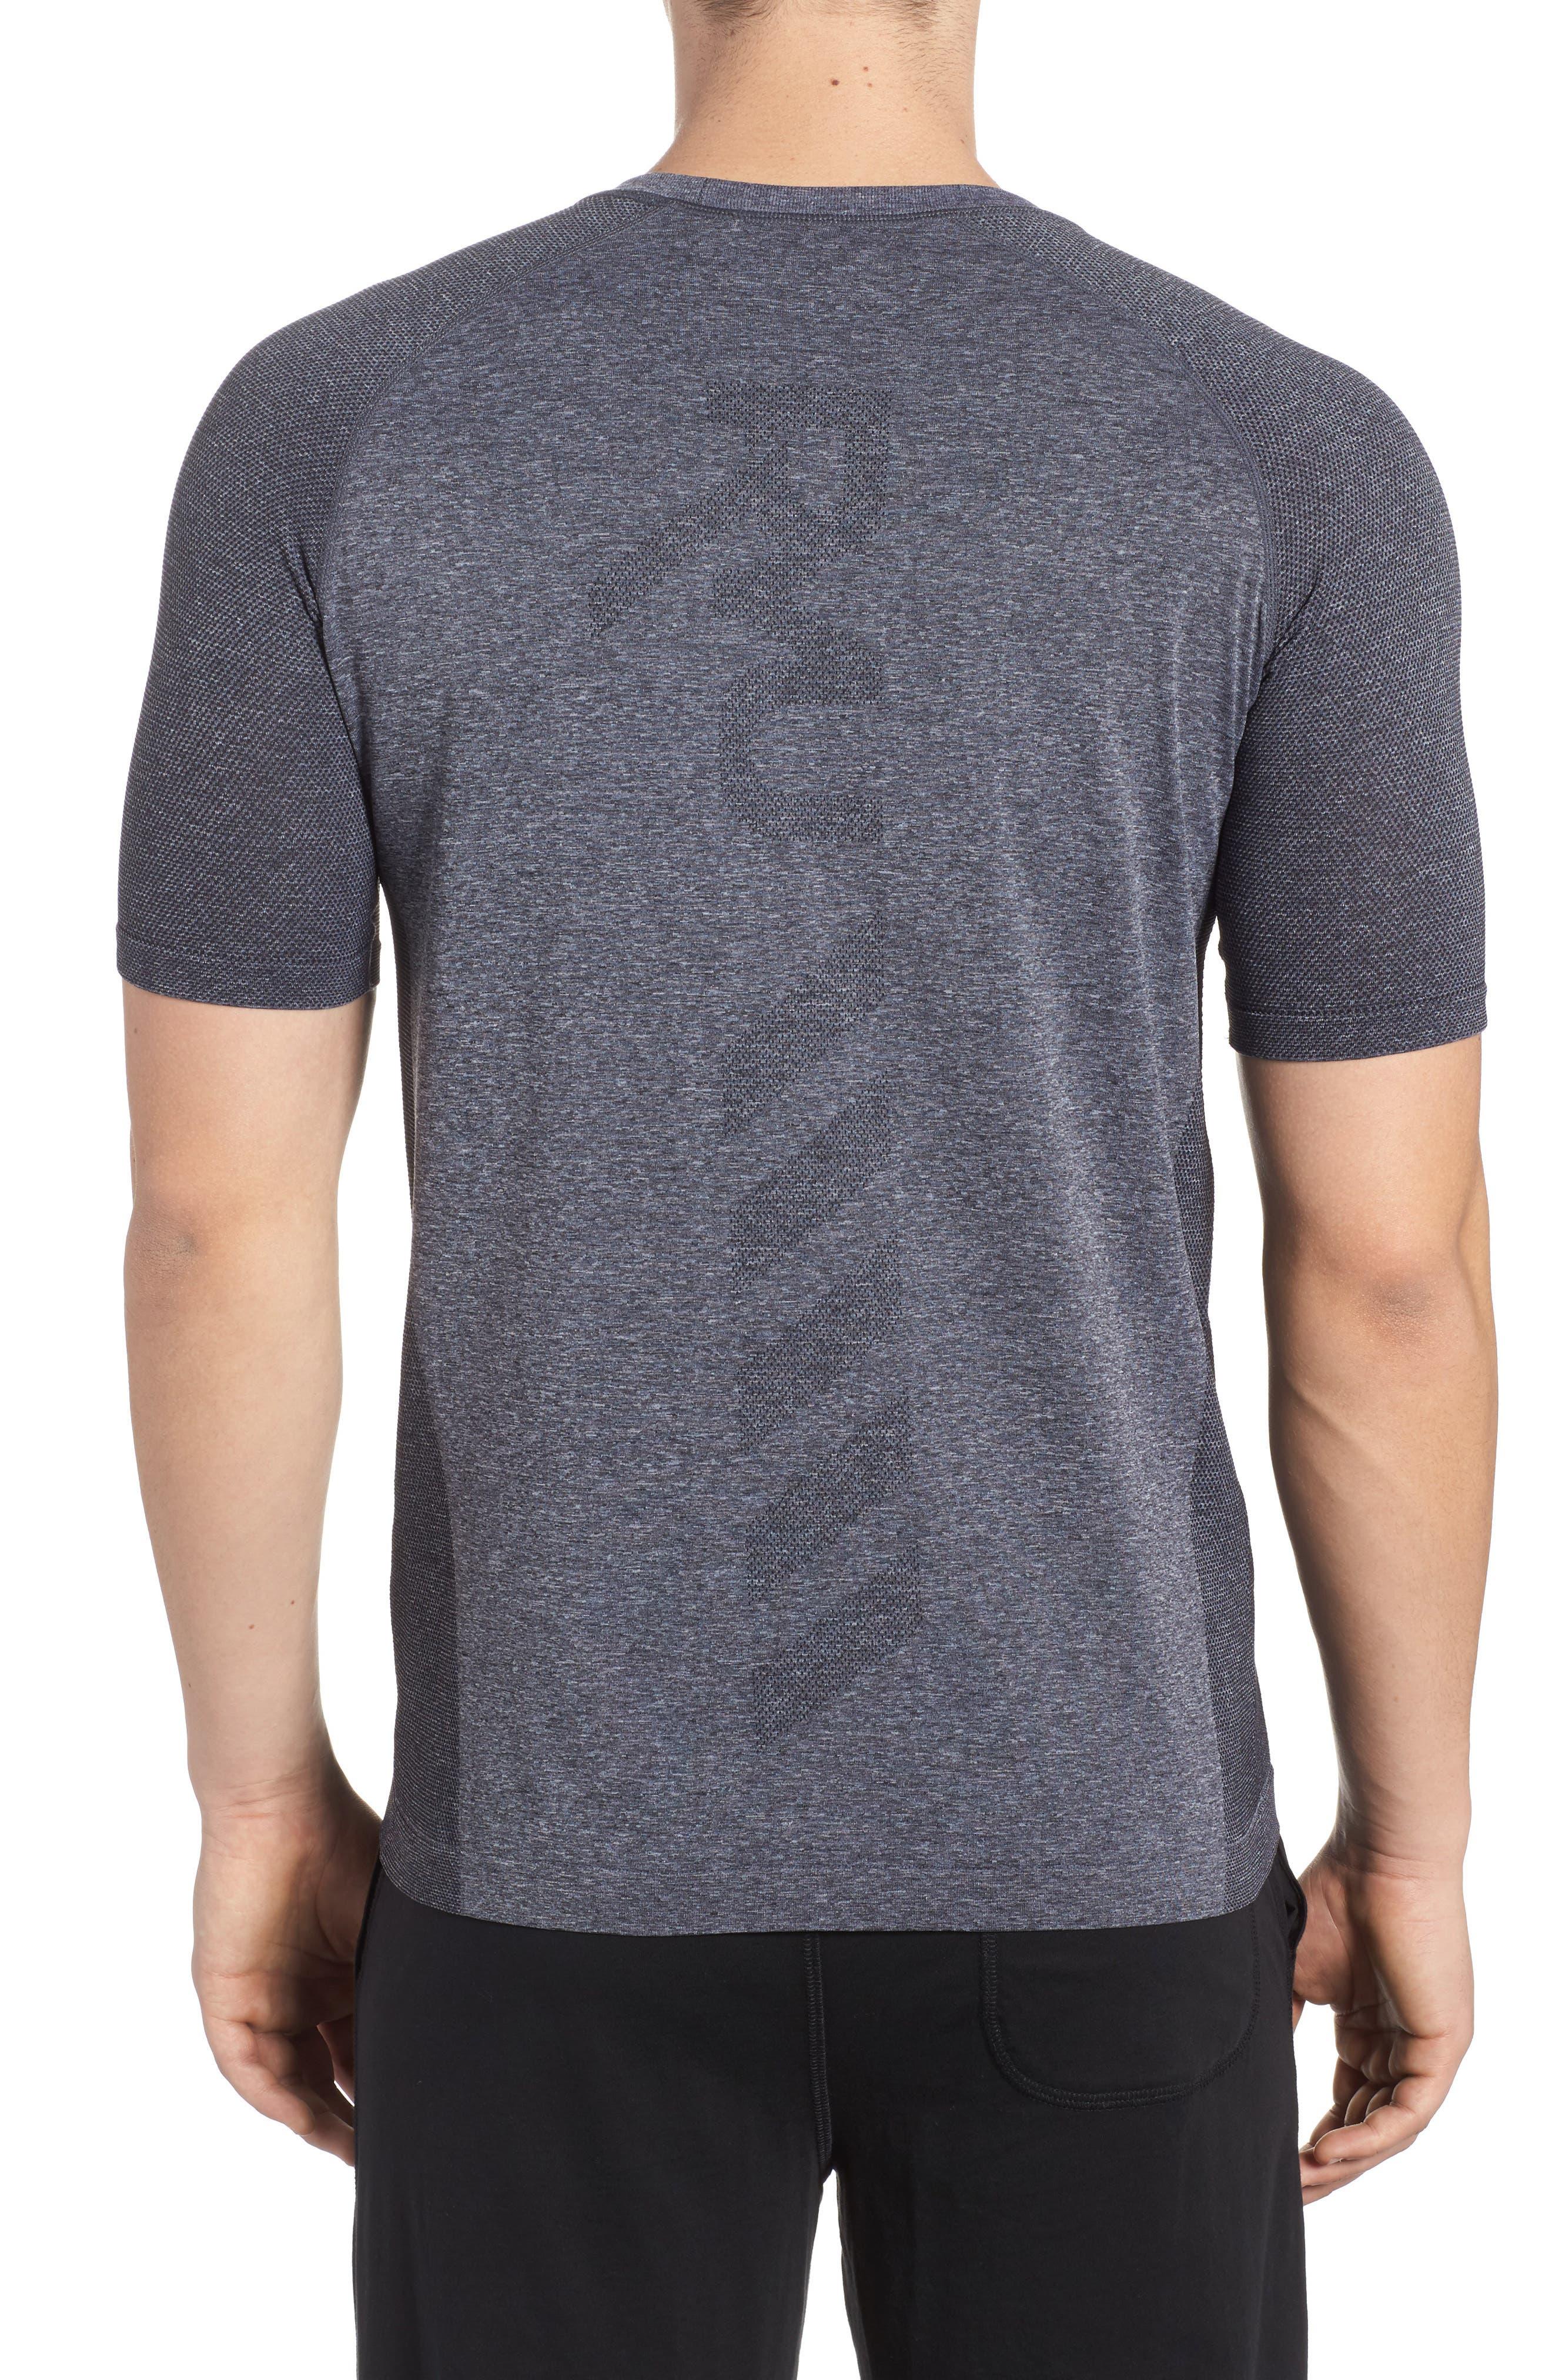 Vapor Performance T-Shirt,                             Alternate thumbnail 2, color,                             ASPHALT